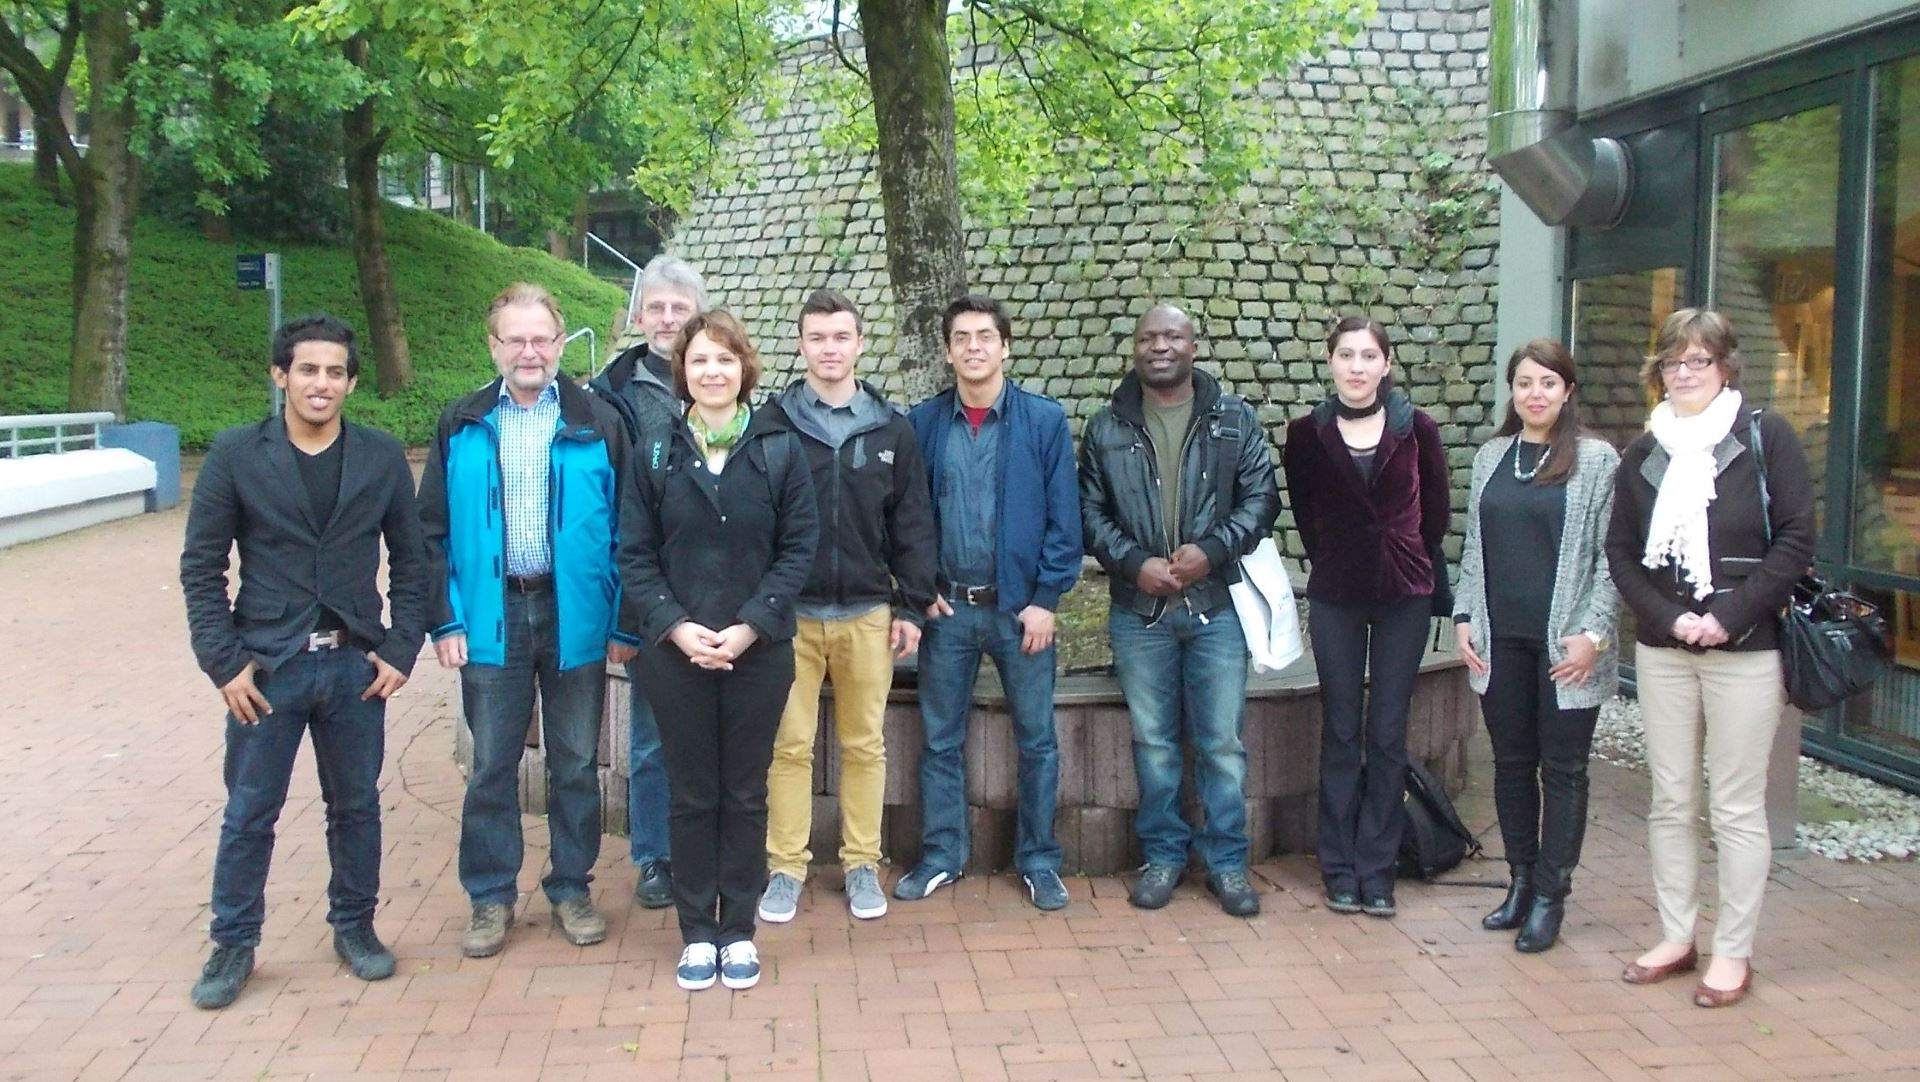 Gruppenfoto der Regionalgruppe Wuppertal